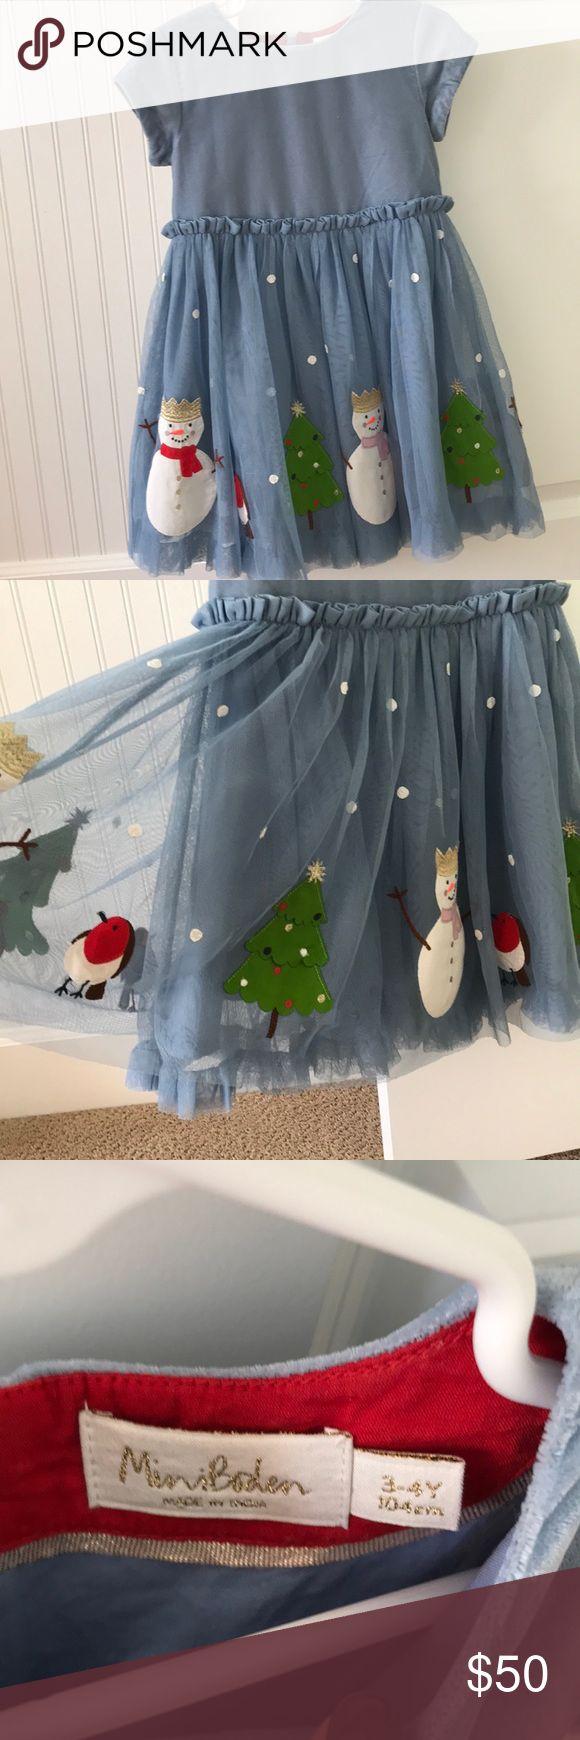 Mini Boden dress Stunning blue with winter patches velvet and tulle skirt dress for Christmas. Worn once for Christmas Eve Mini Boden Dresses Formal